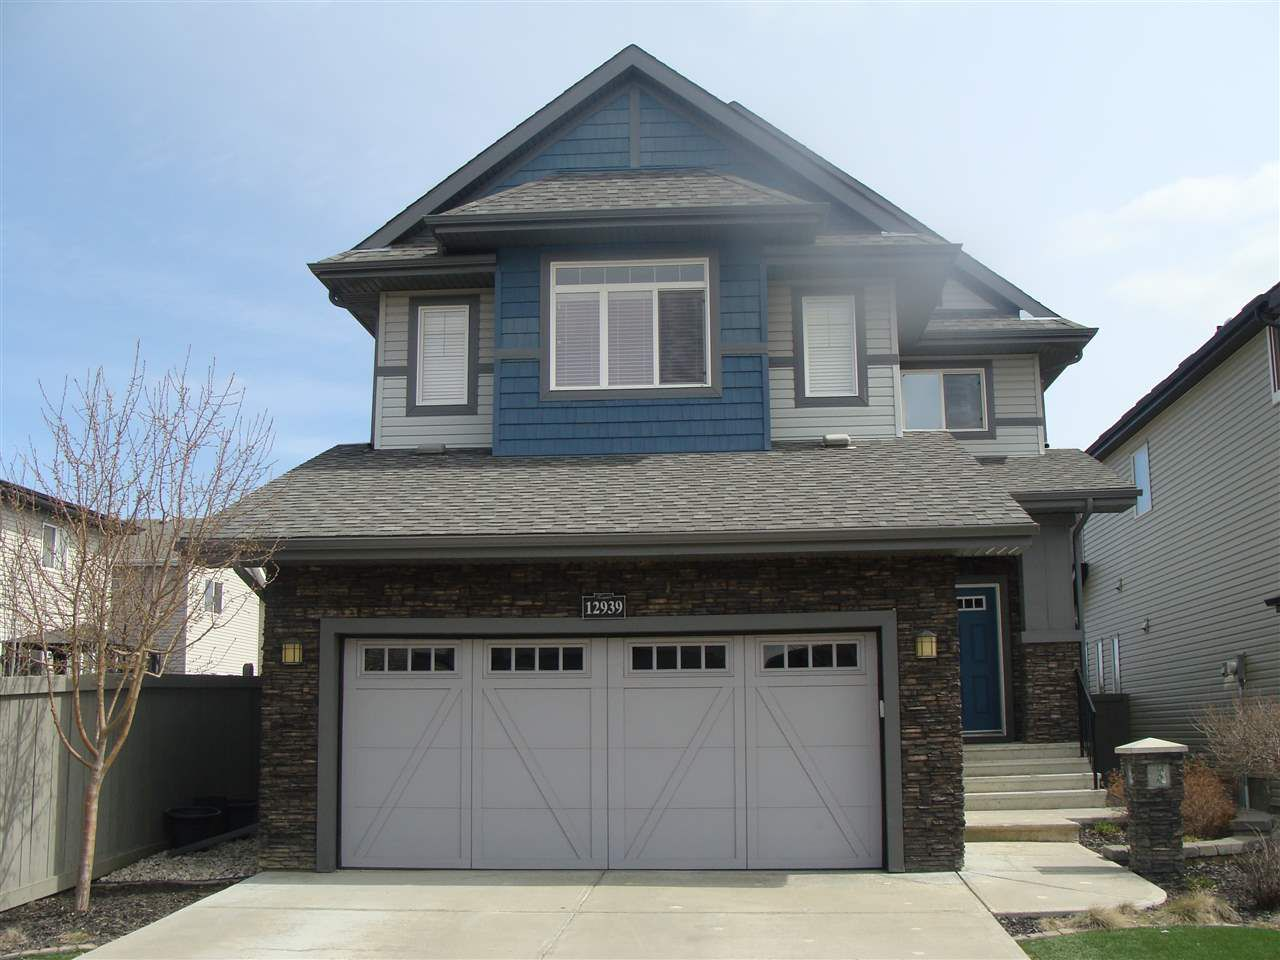 Main Photo: 12939 201 Street in Edmonton: Zone 59 House for sale : MLS®# E4135226